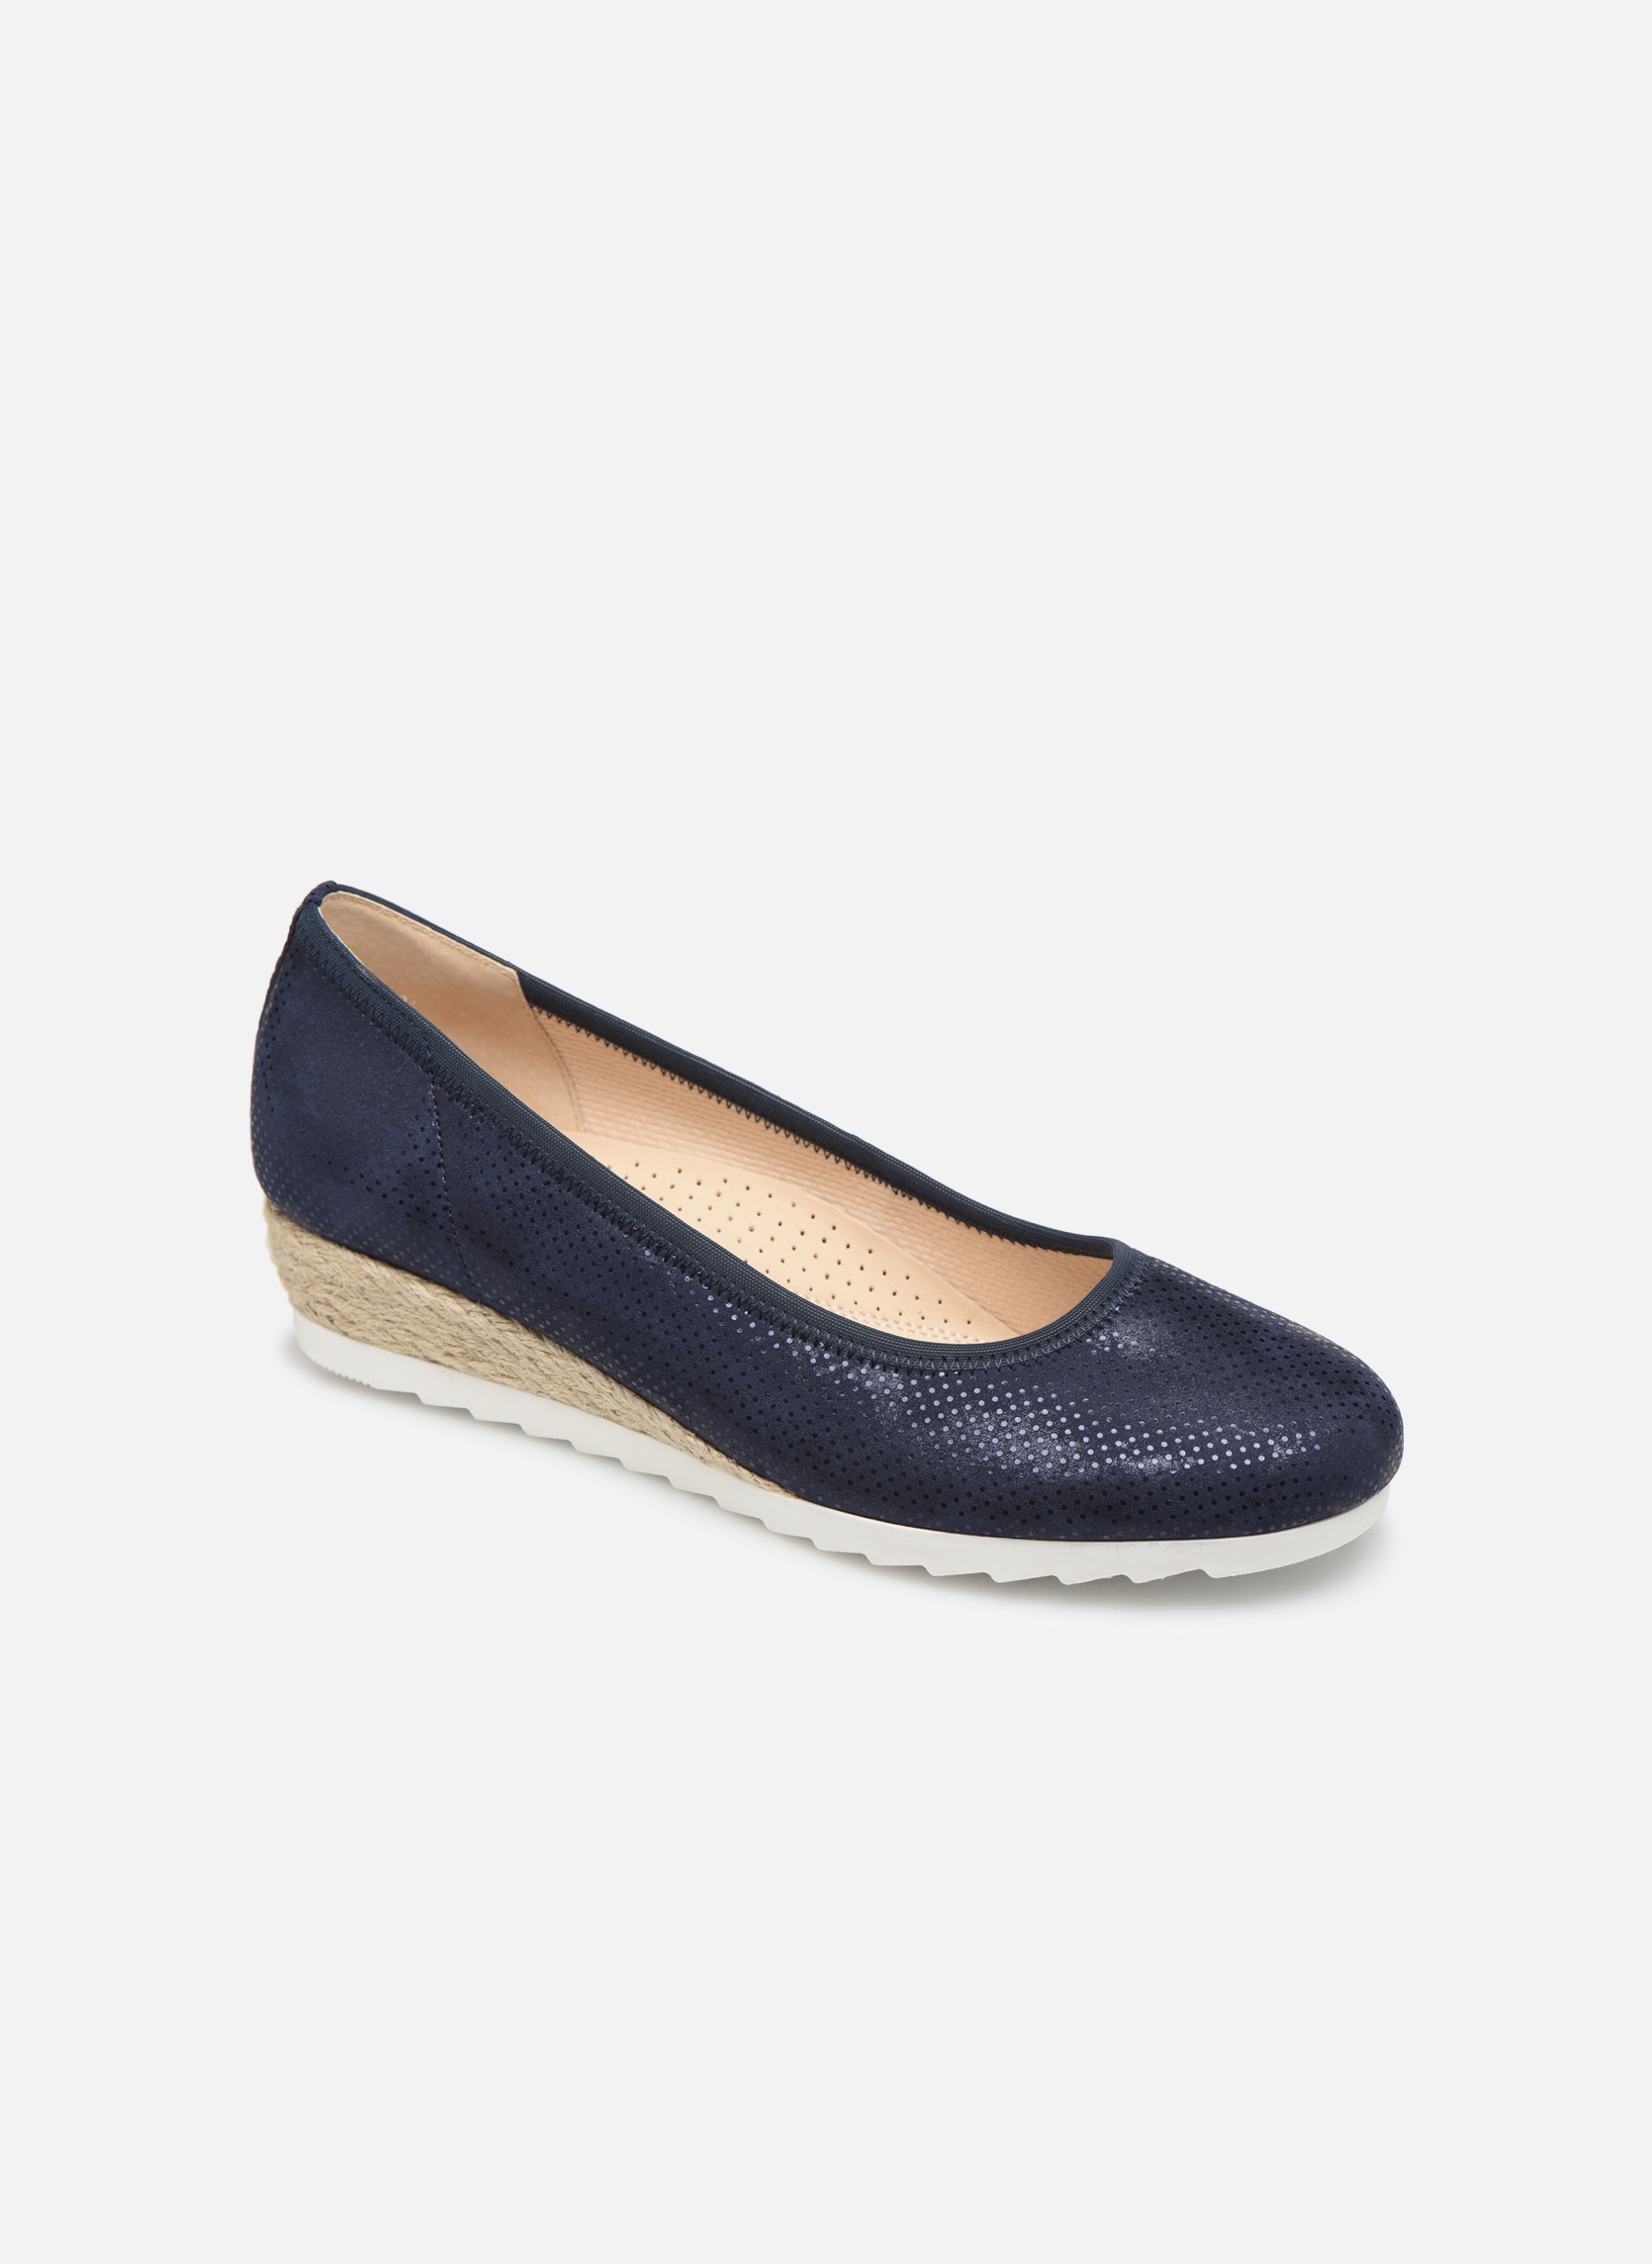 Marques Chaussure femme Gabor femme Novara Night Blue